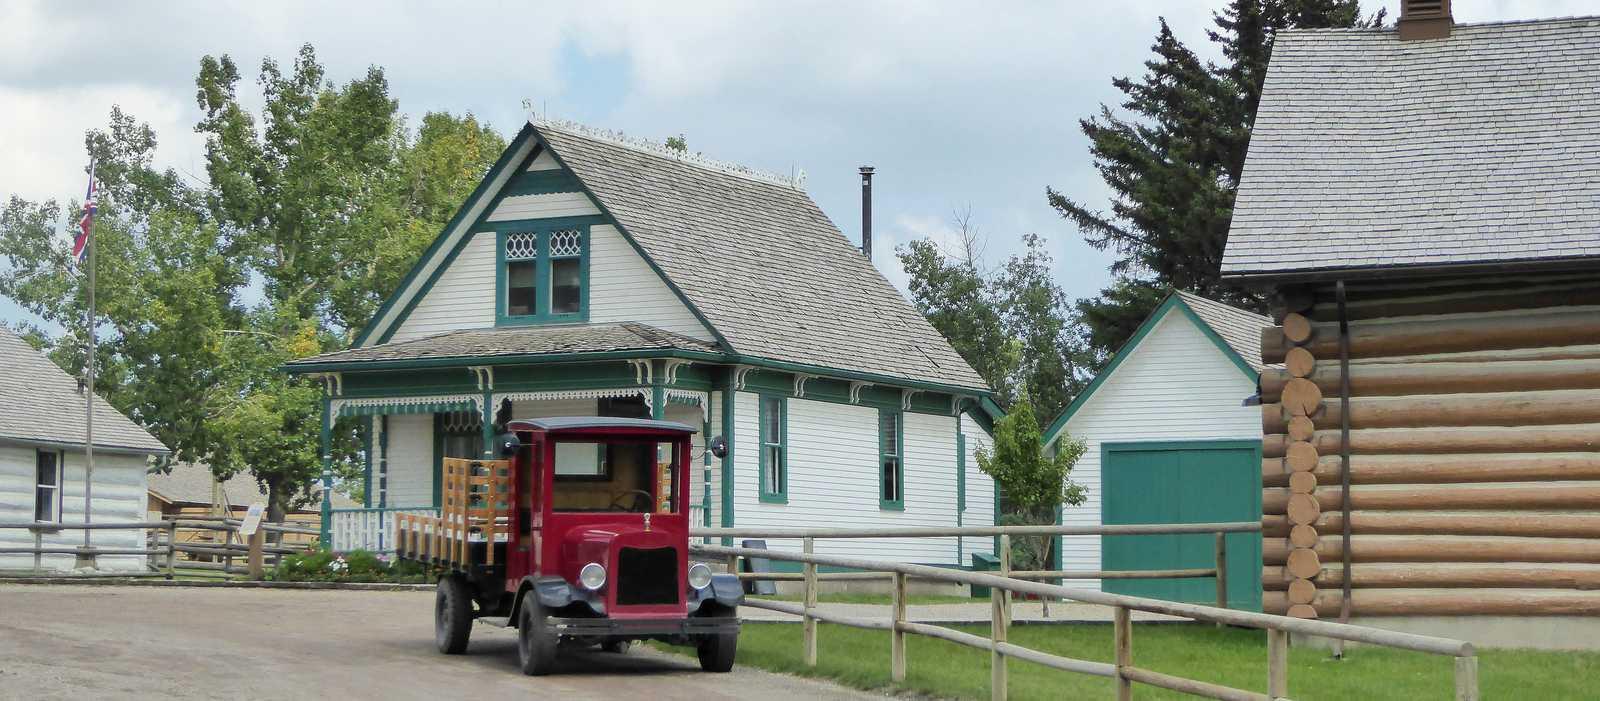 Heritage Park Historic Village